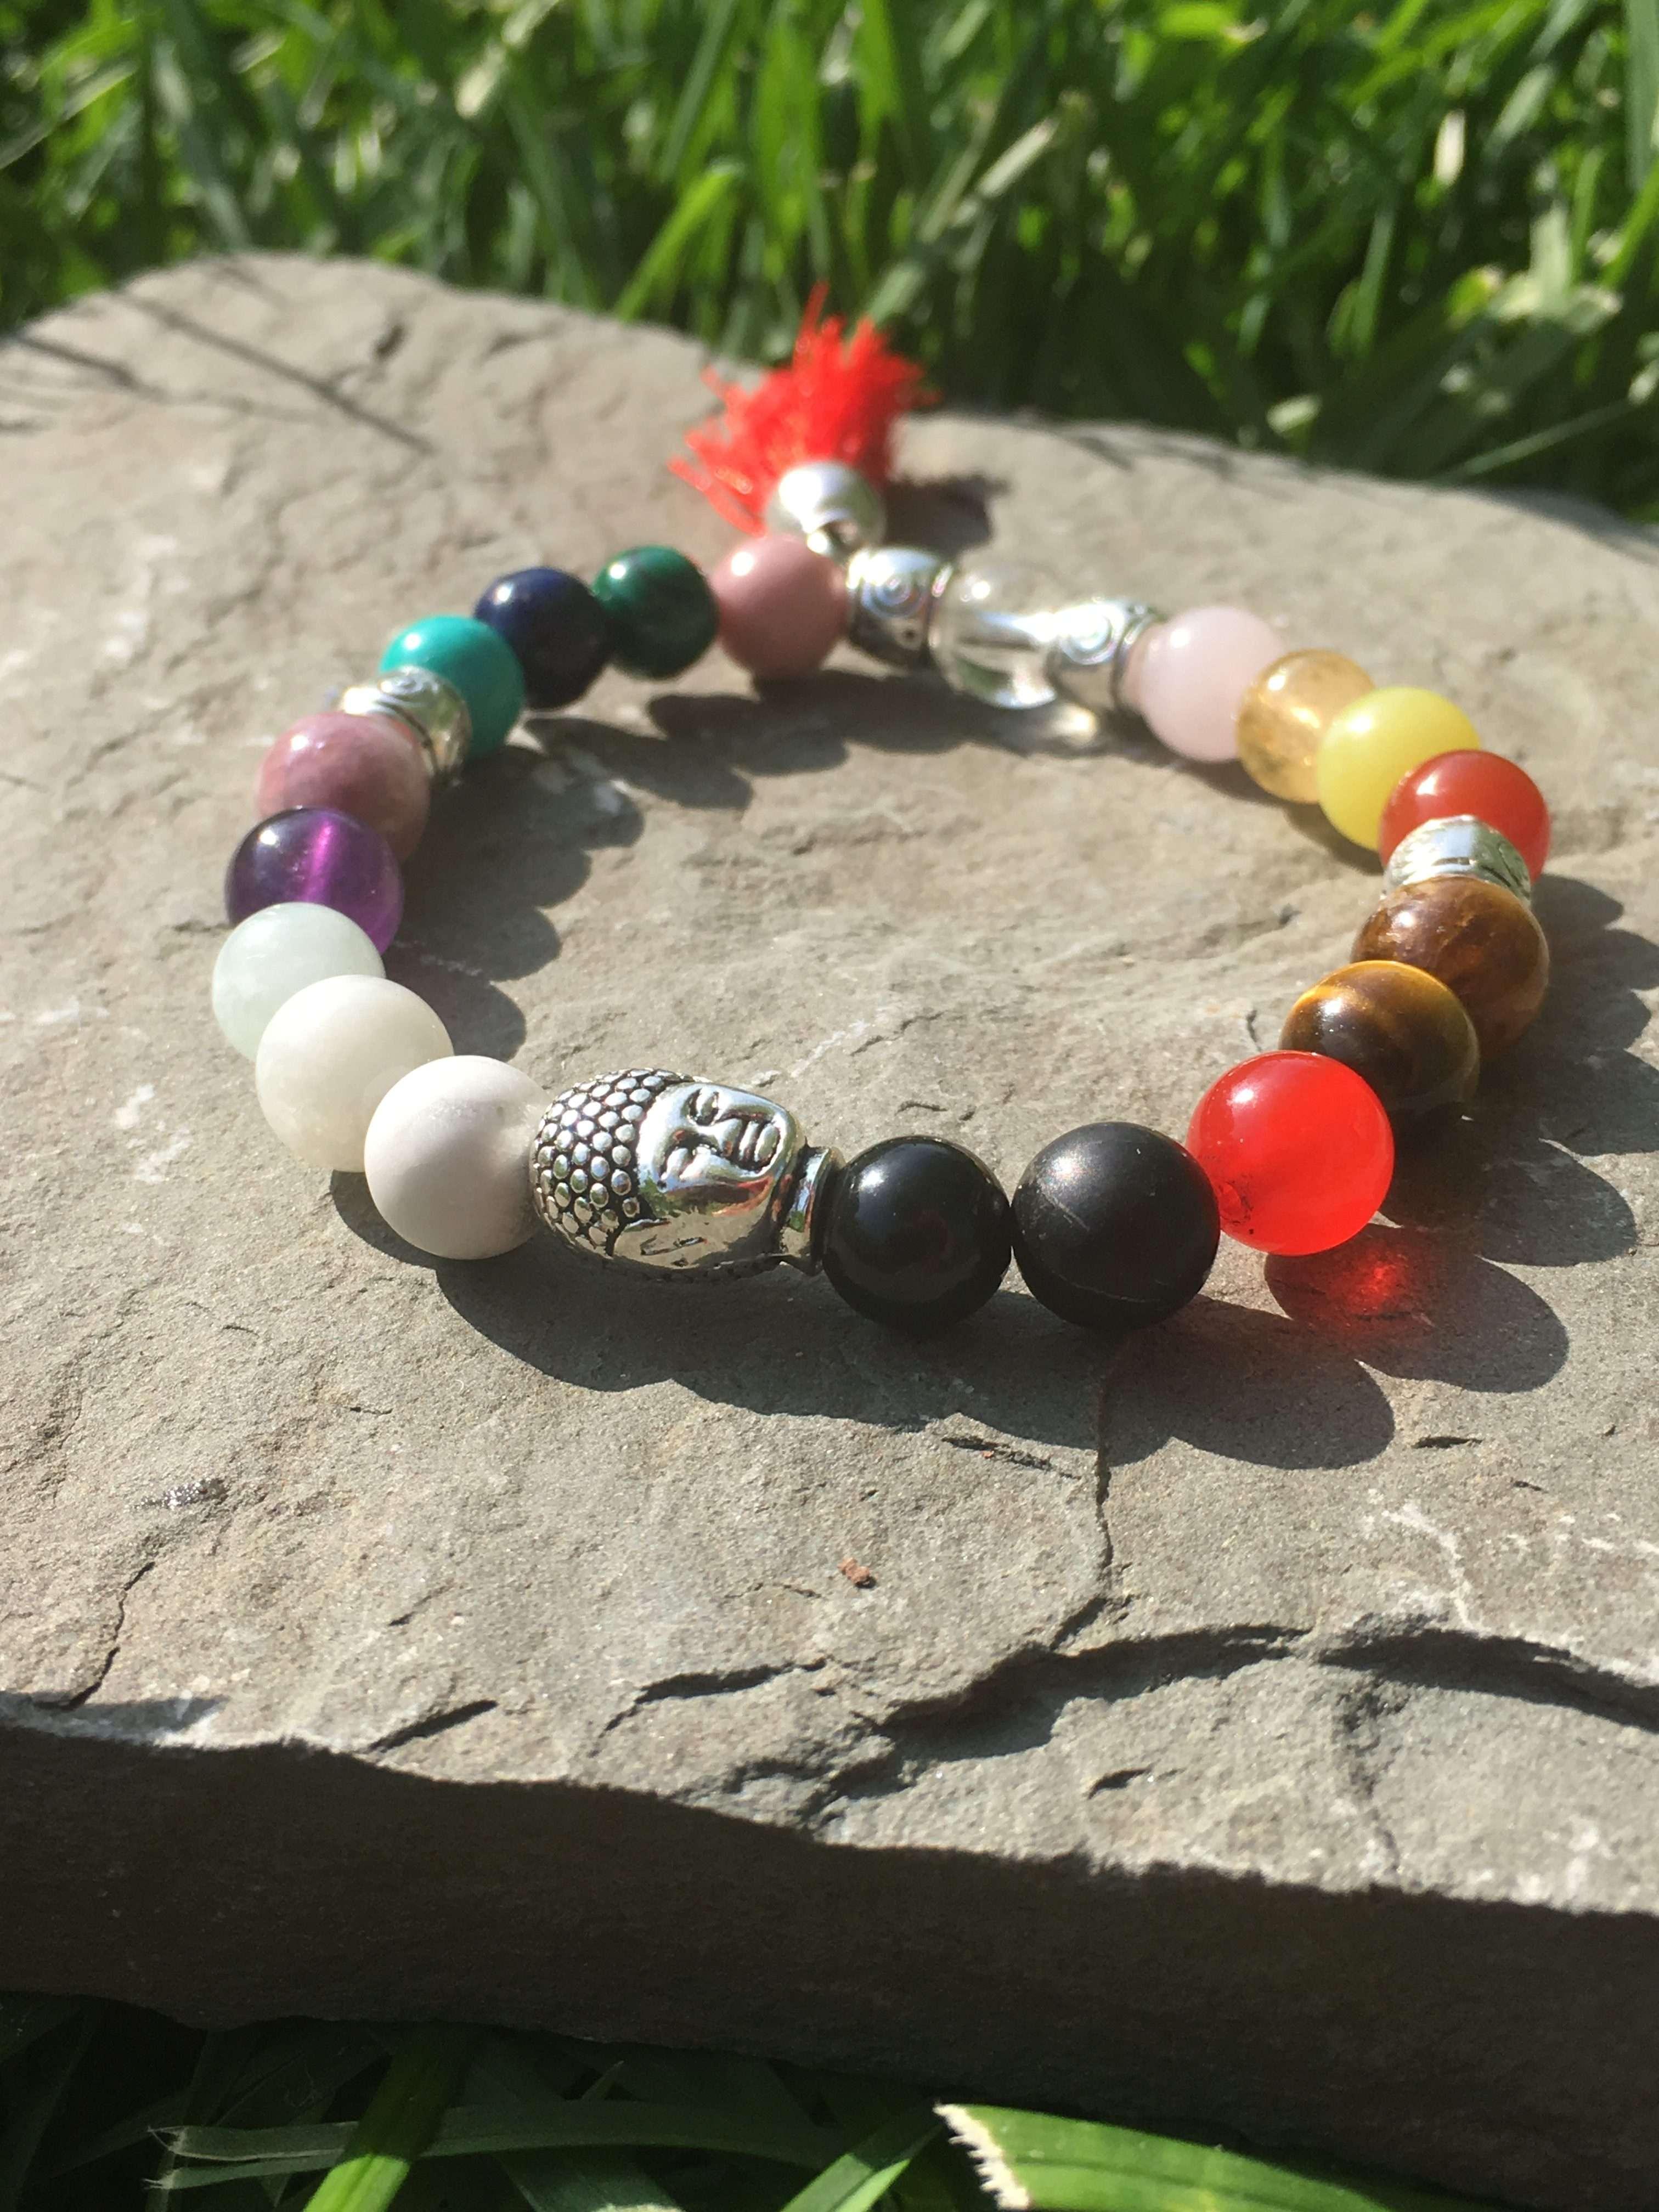 KK_S18 Chakra Bliss (Silver) Reiki Healing Bracelets, Reiki infused, Energy  Bracelet, Crystal Healing, Reiki Charged, women bracelet